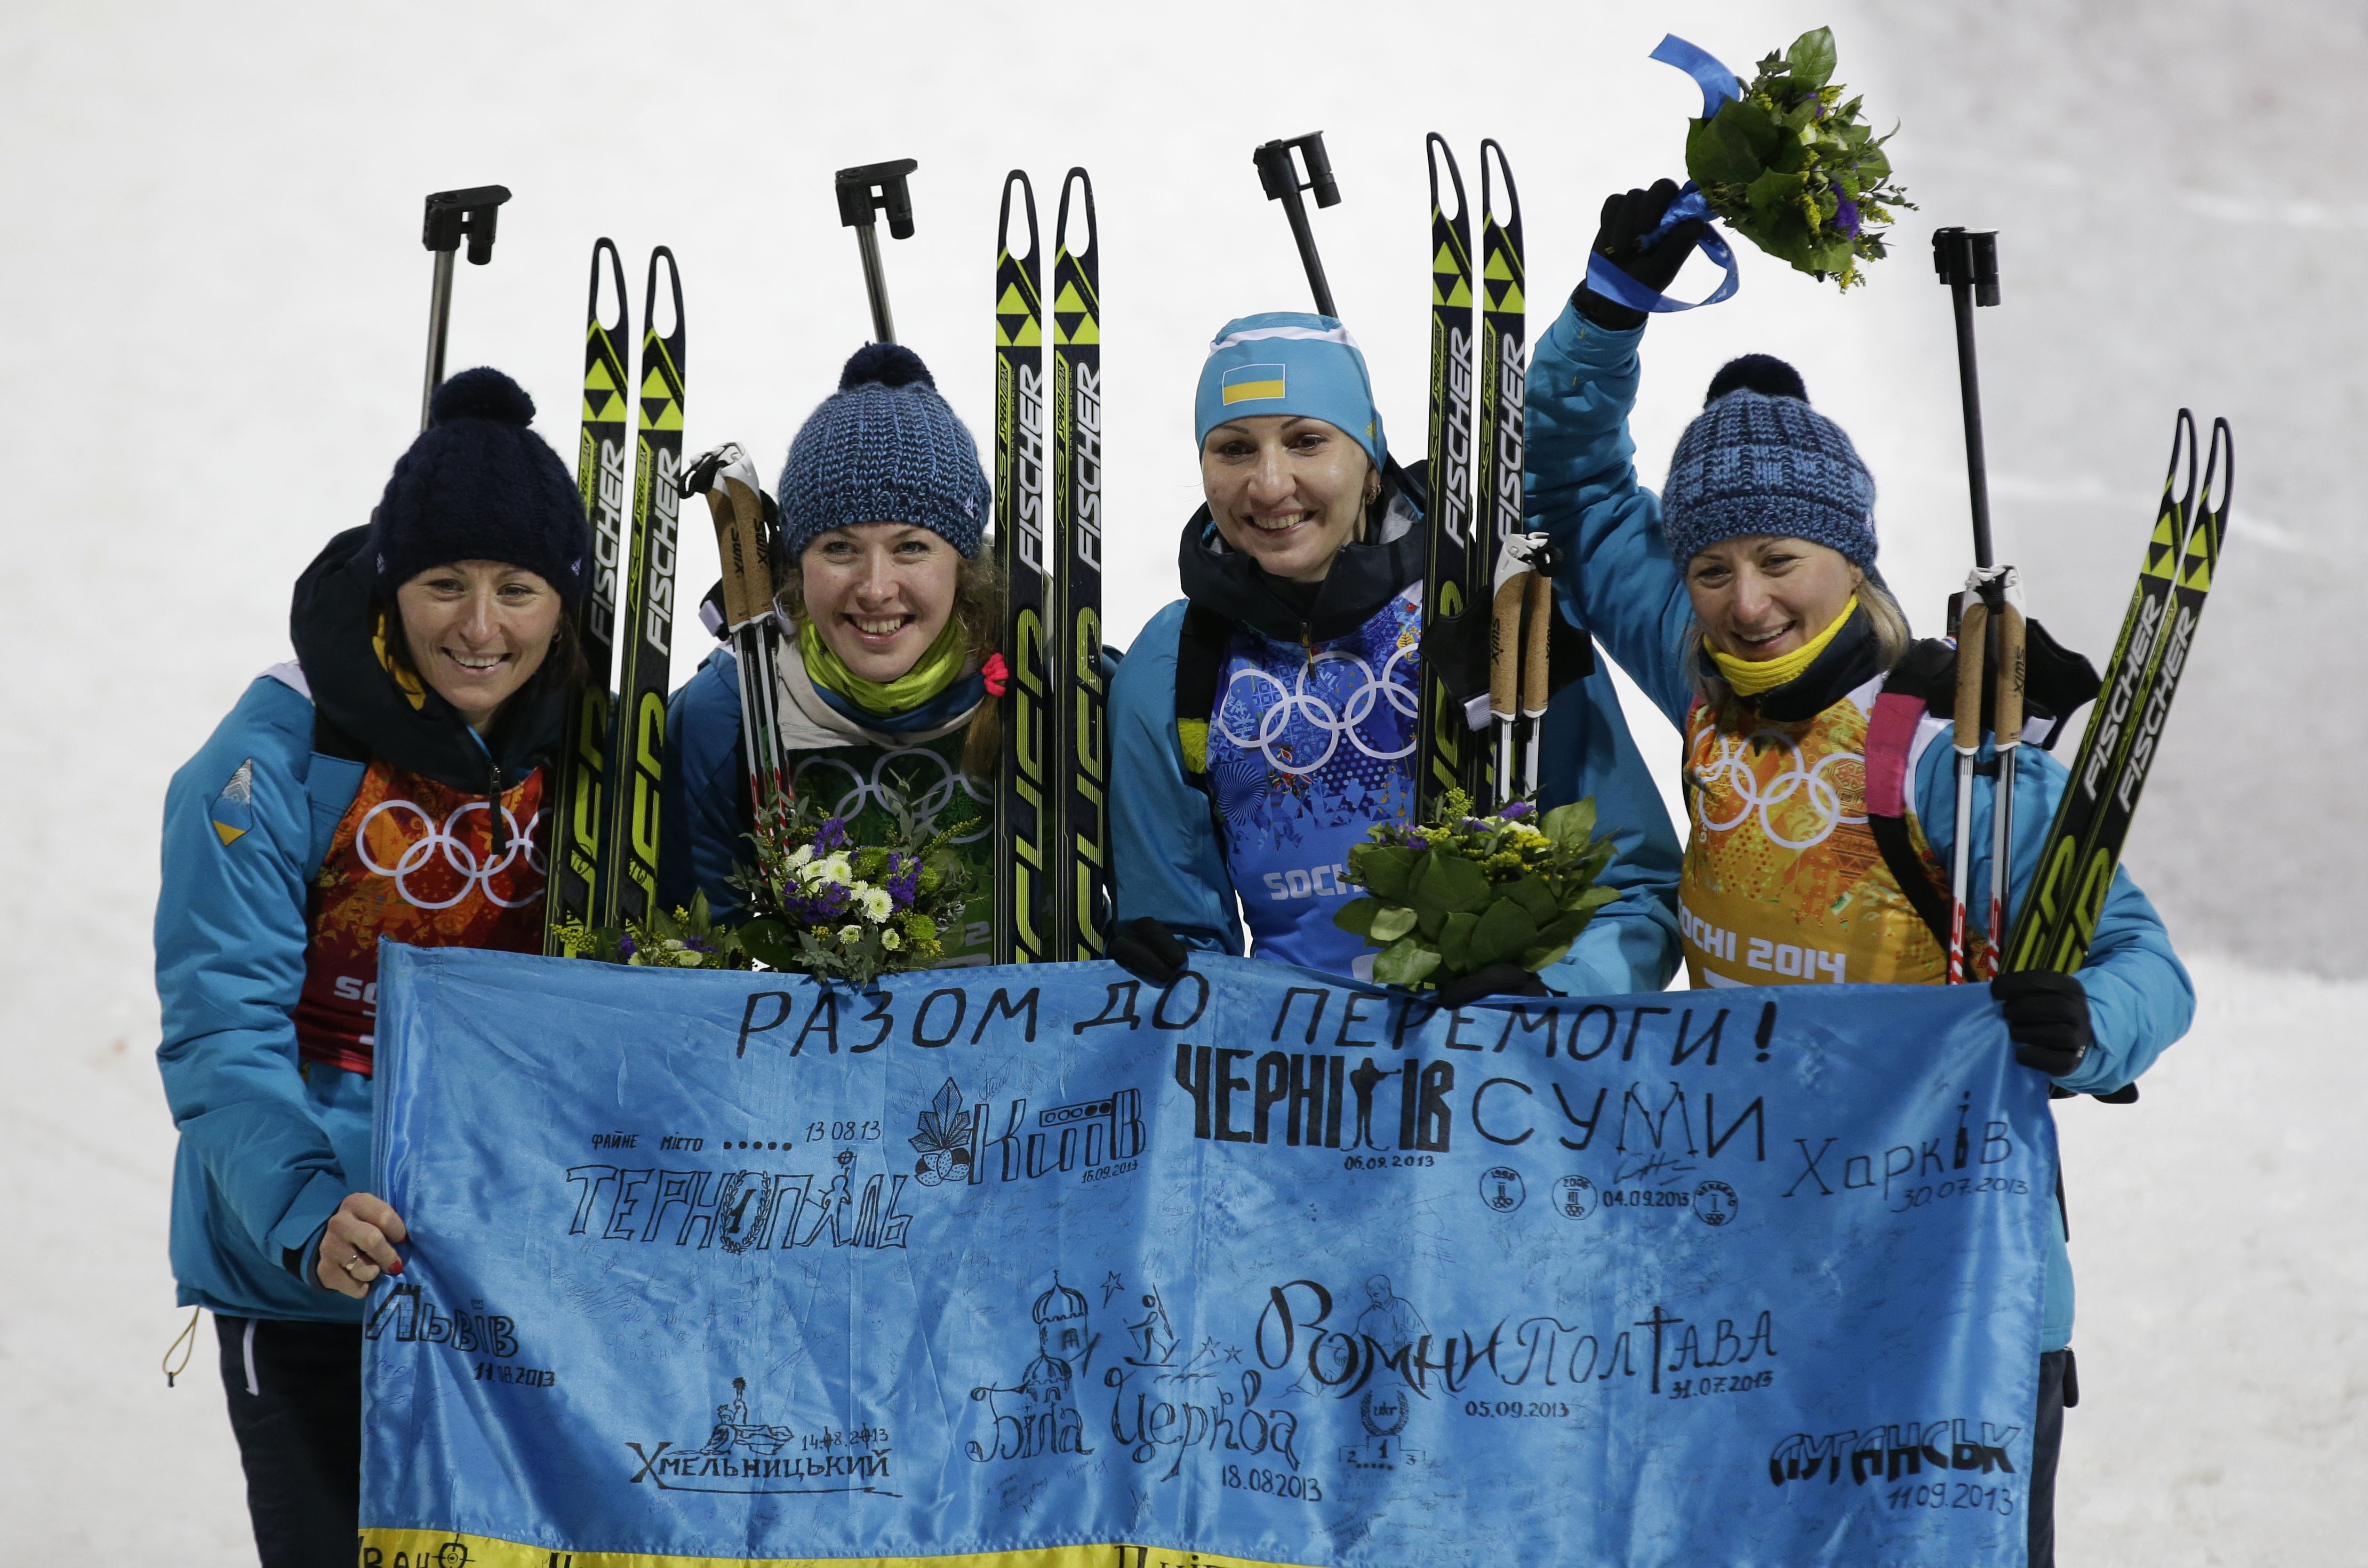 From left, Ukraine's relay team Vita Semerenko, Juliya Dzhyma, Olena Pidhrushna and Valj Semerenko pose with an Ukraine's flag, after winning the gold medal in the women's biathlon 4x6k relay at the 2014 Winter Olympics, Friday, Feb. 21, 2014, in Krasnaya Polyana, Russia. (AP Photo/Lee Jin-man)